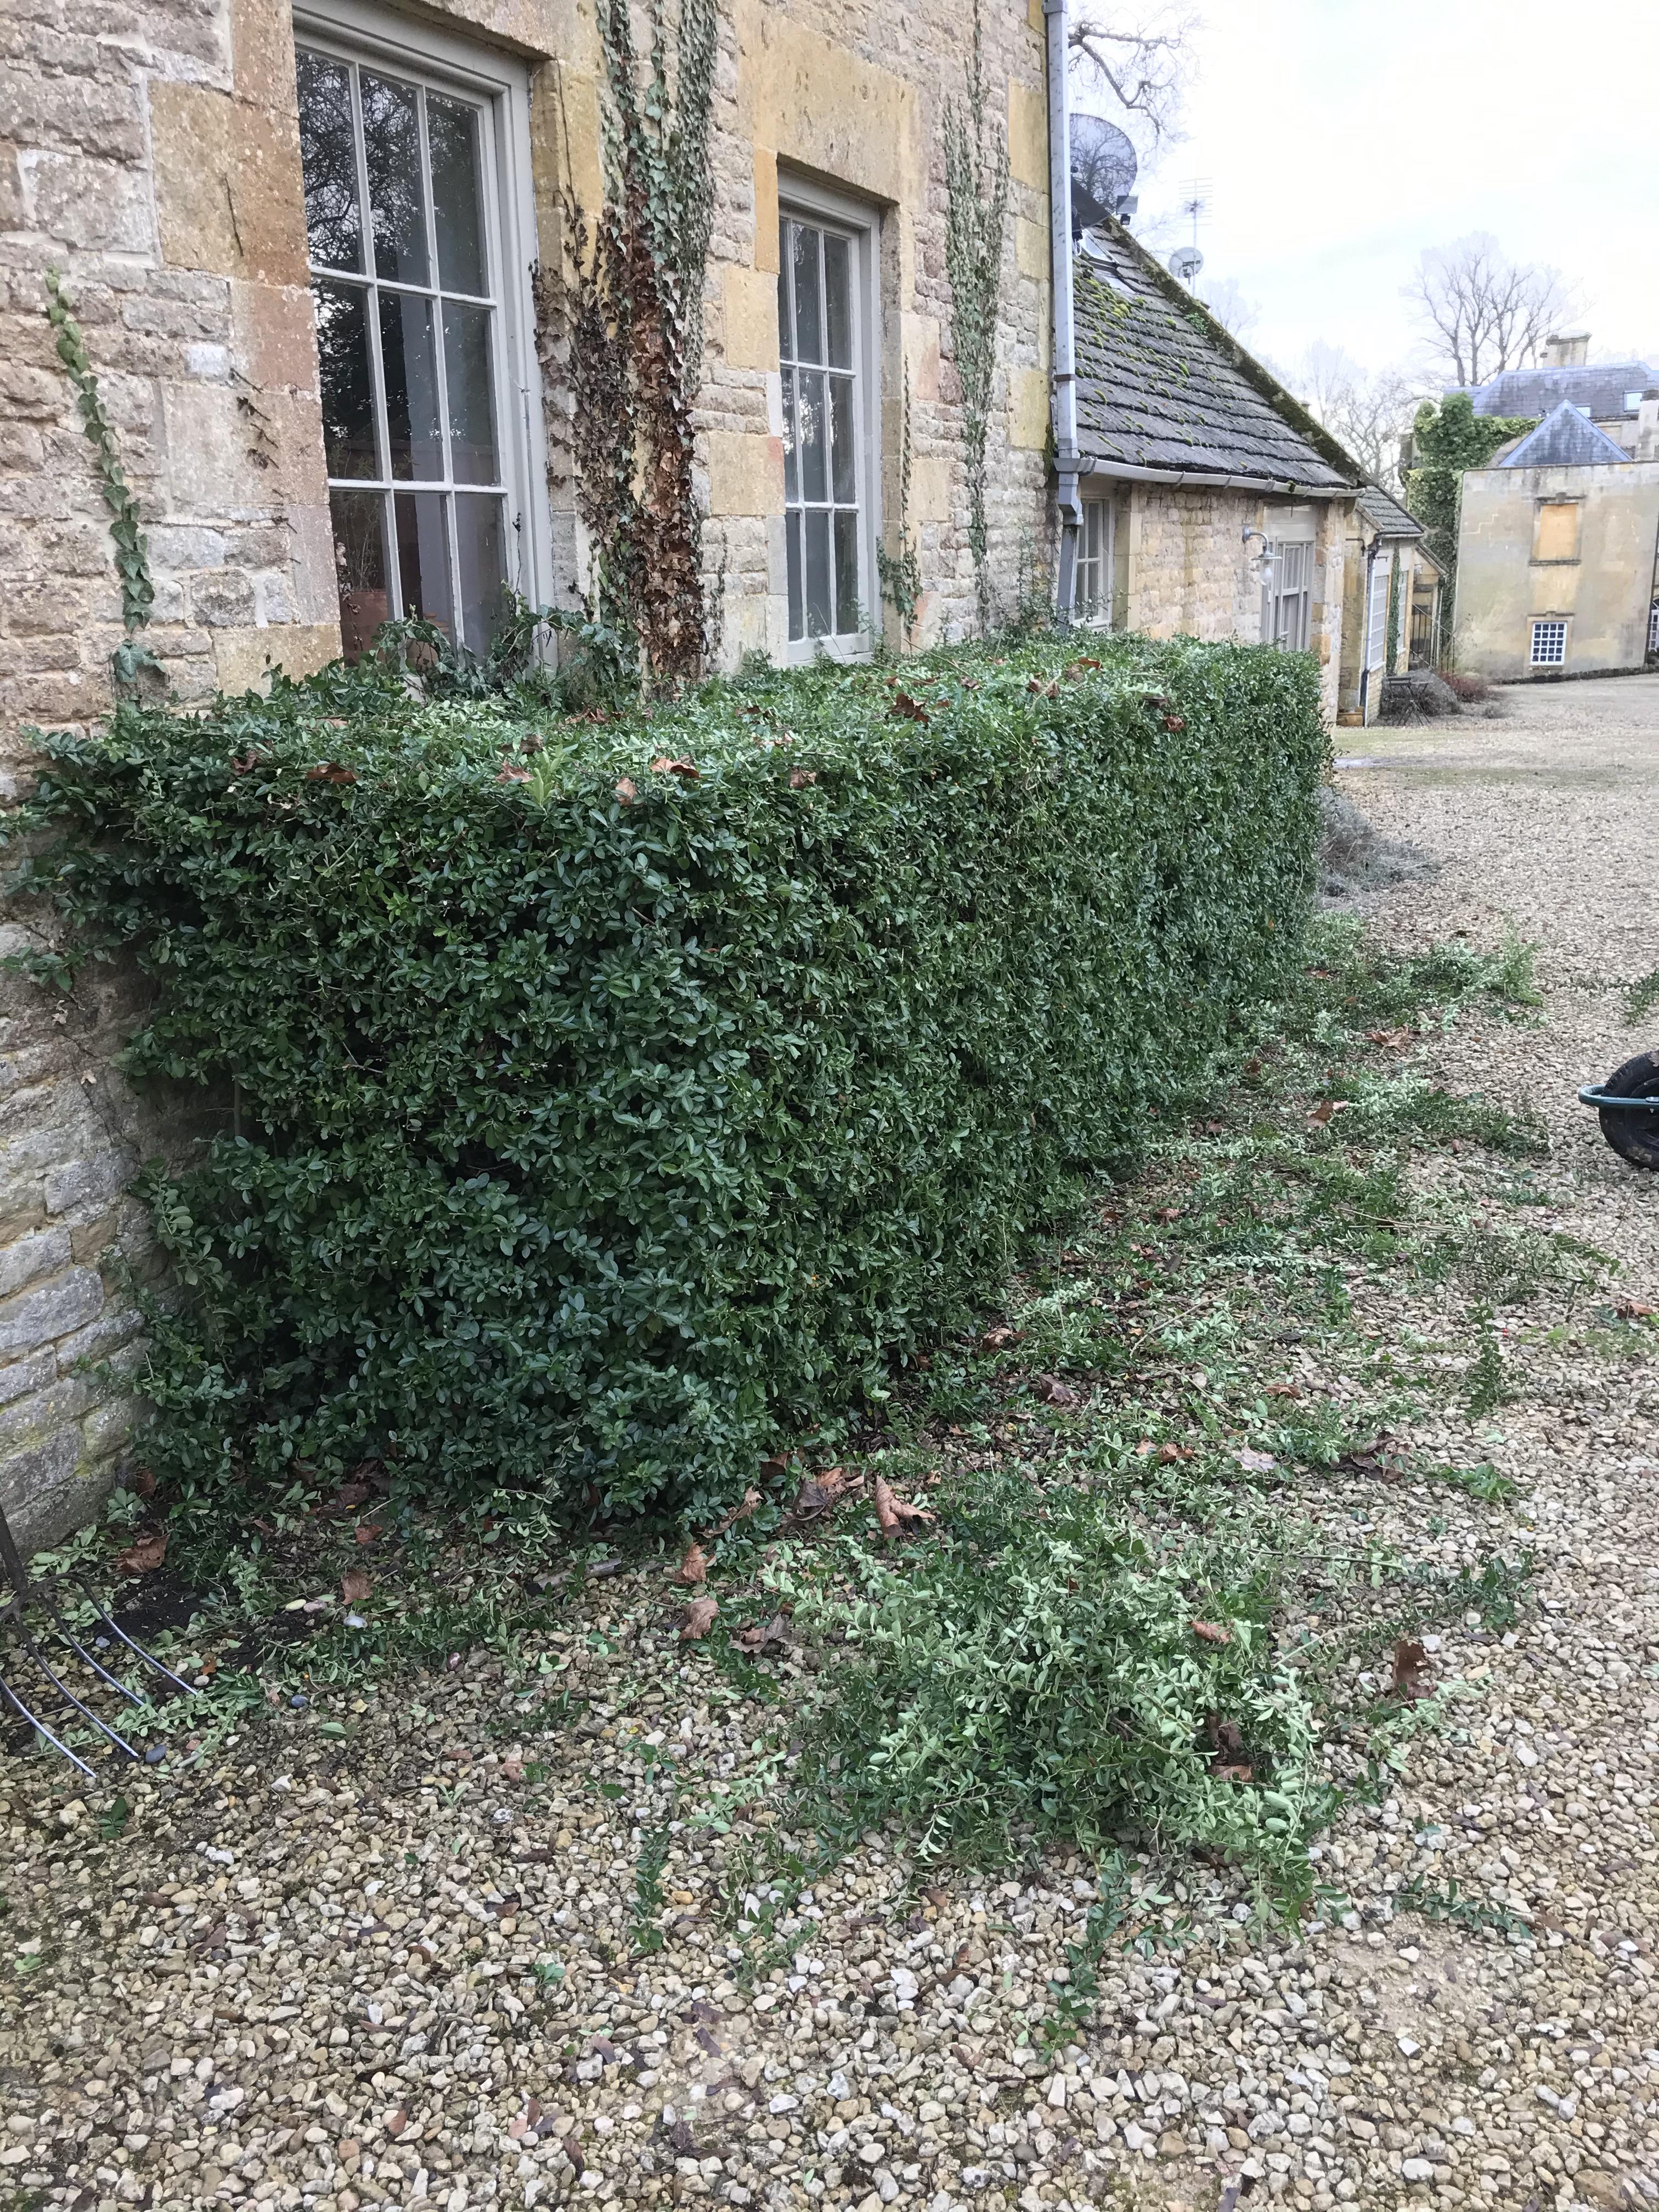 Hedge trimming a thorny bush